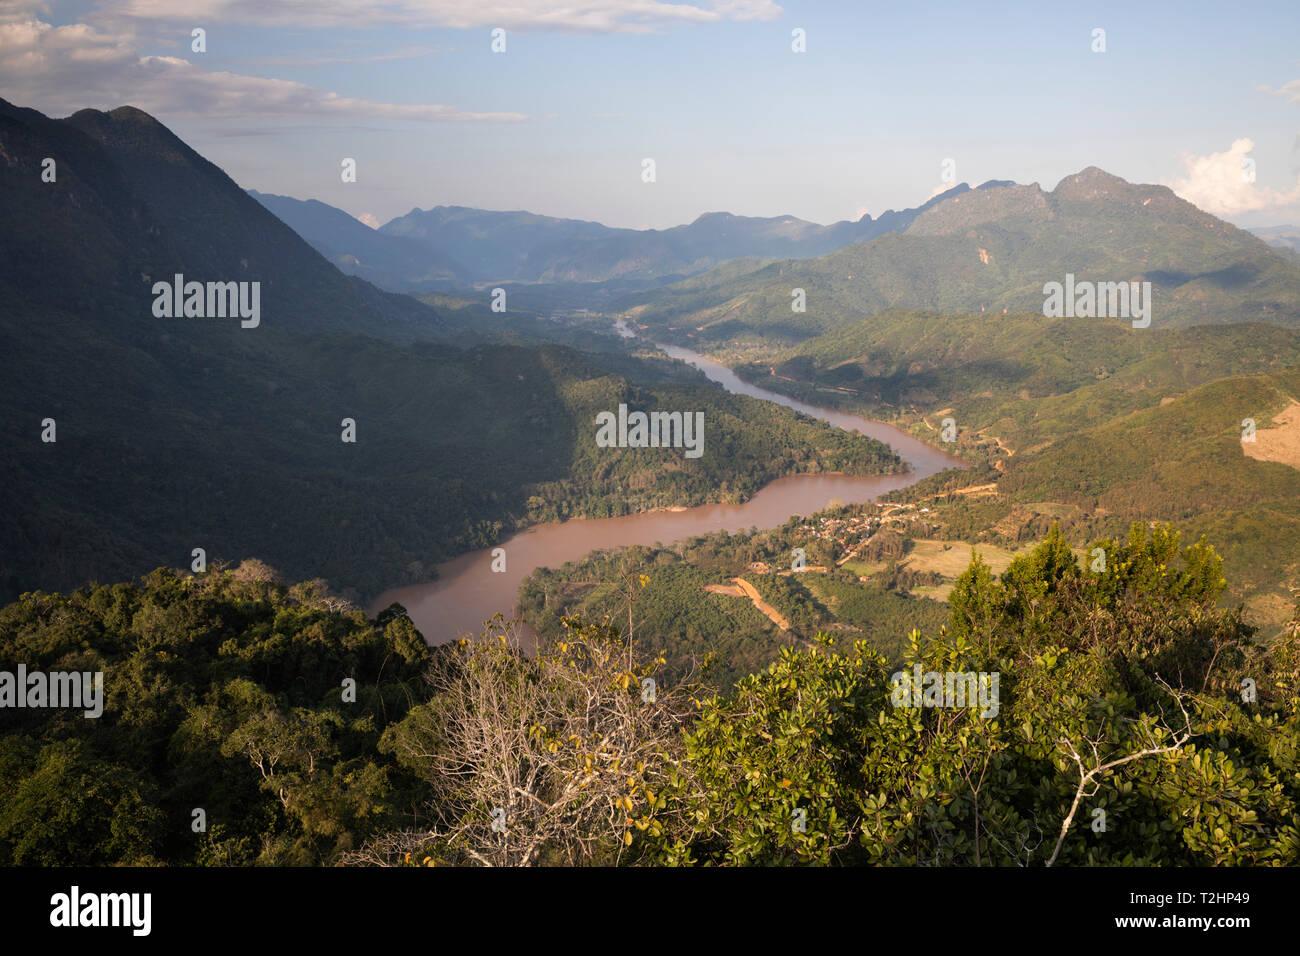 Karsk Gipfel und den Nam Ou Fluss von der Oberseite des Pha Daeng Peak Viewpoint, Nong Khiaw, Provinz Luang Prabang Laos, Südostasien Stockbild